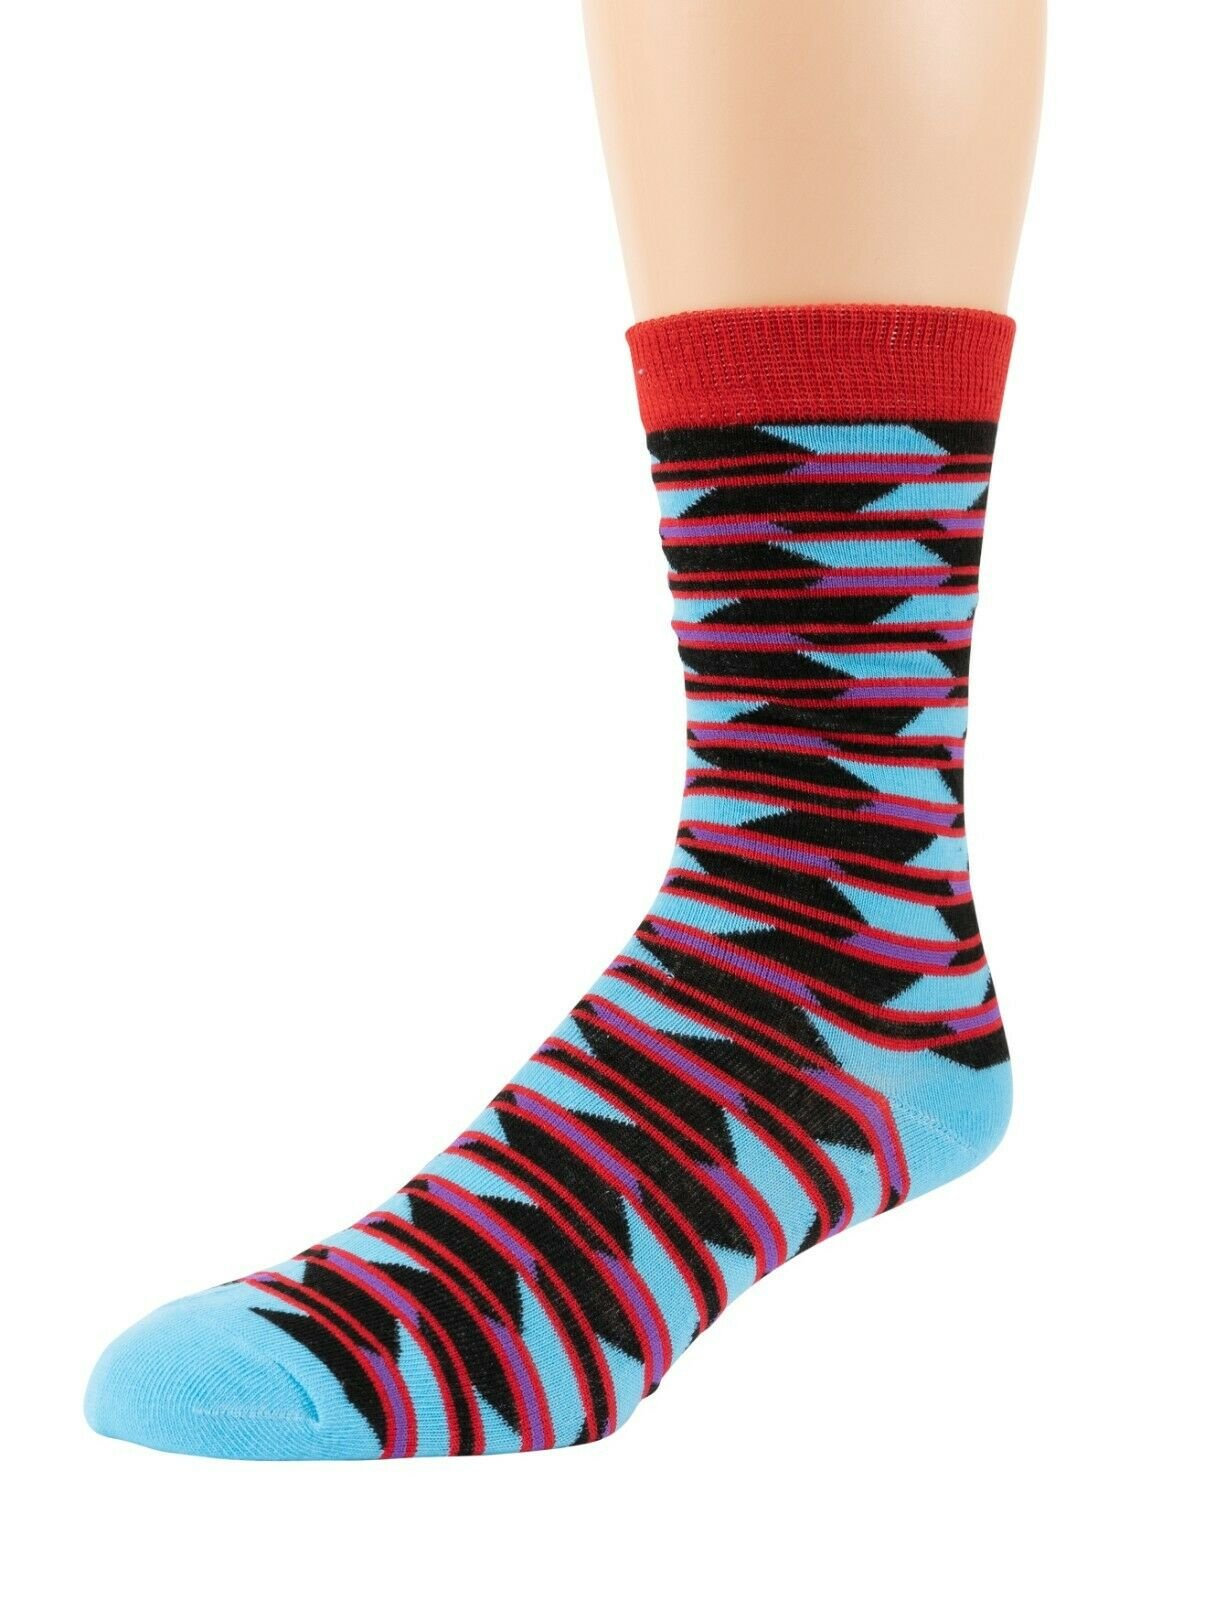 Mitch-Bogen-Mens-Cotton-Dress-Socks-Colorful-Fashion-Crew-Socks-8-Pack-Gift-Box thumbnail 42